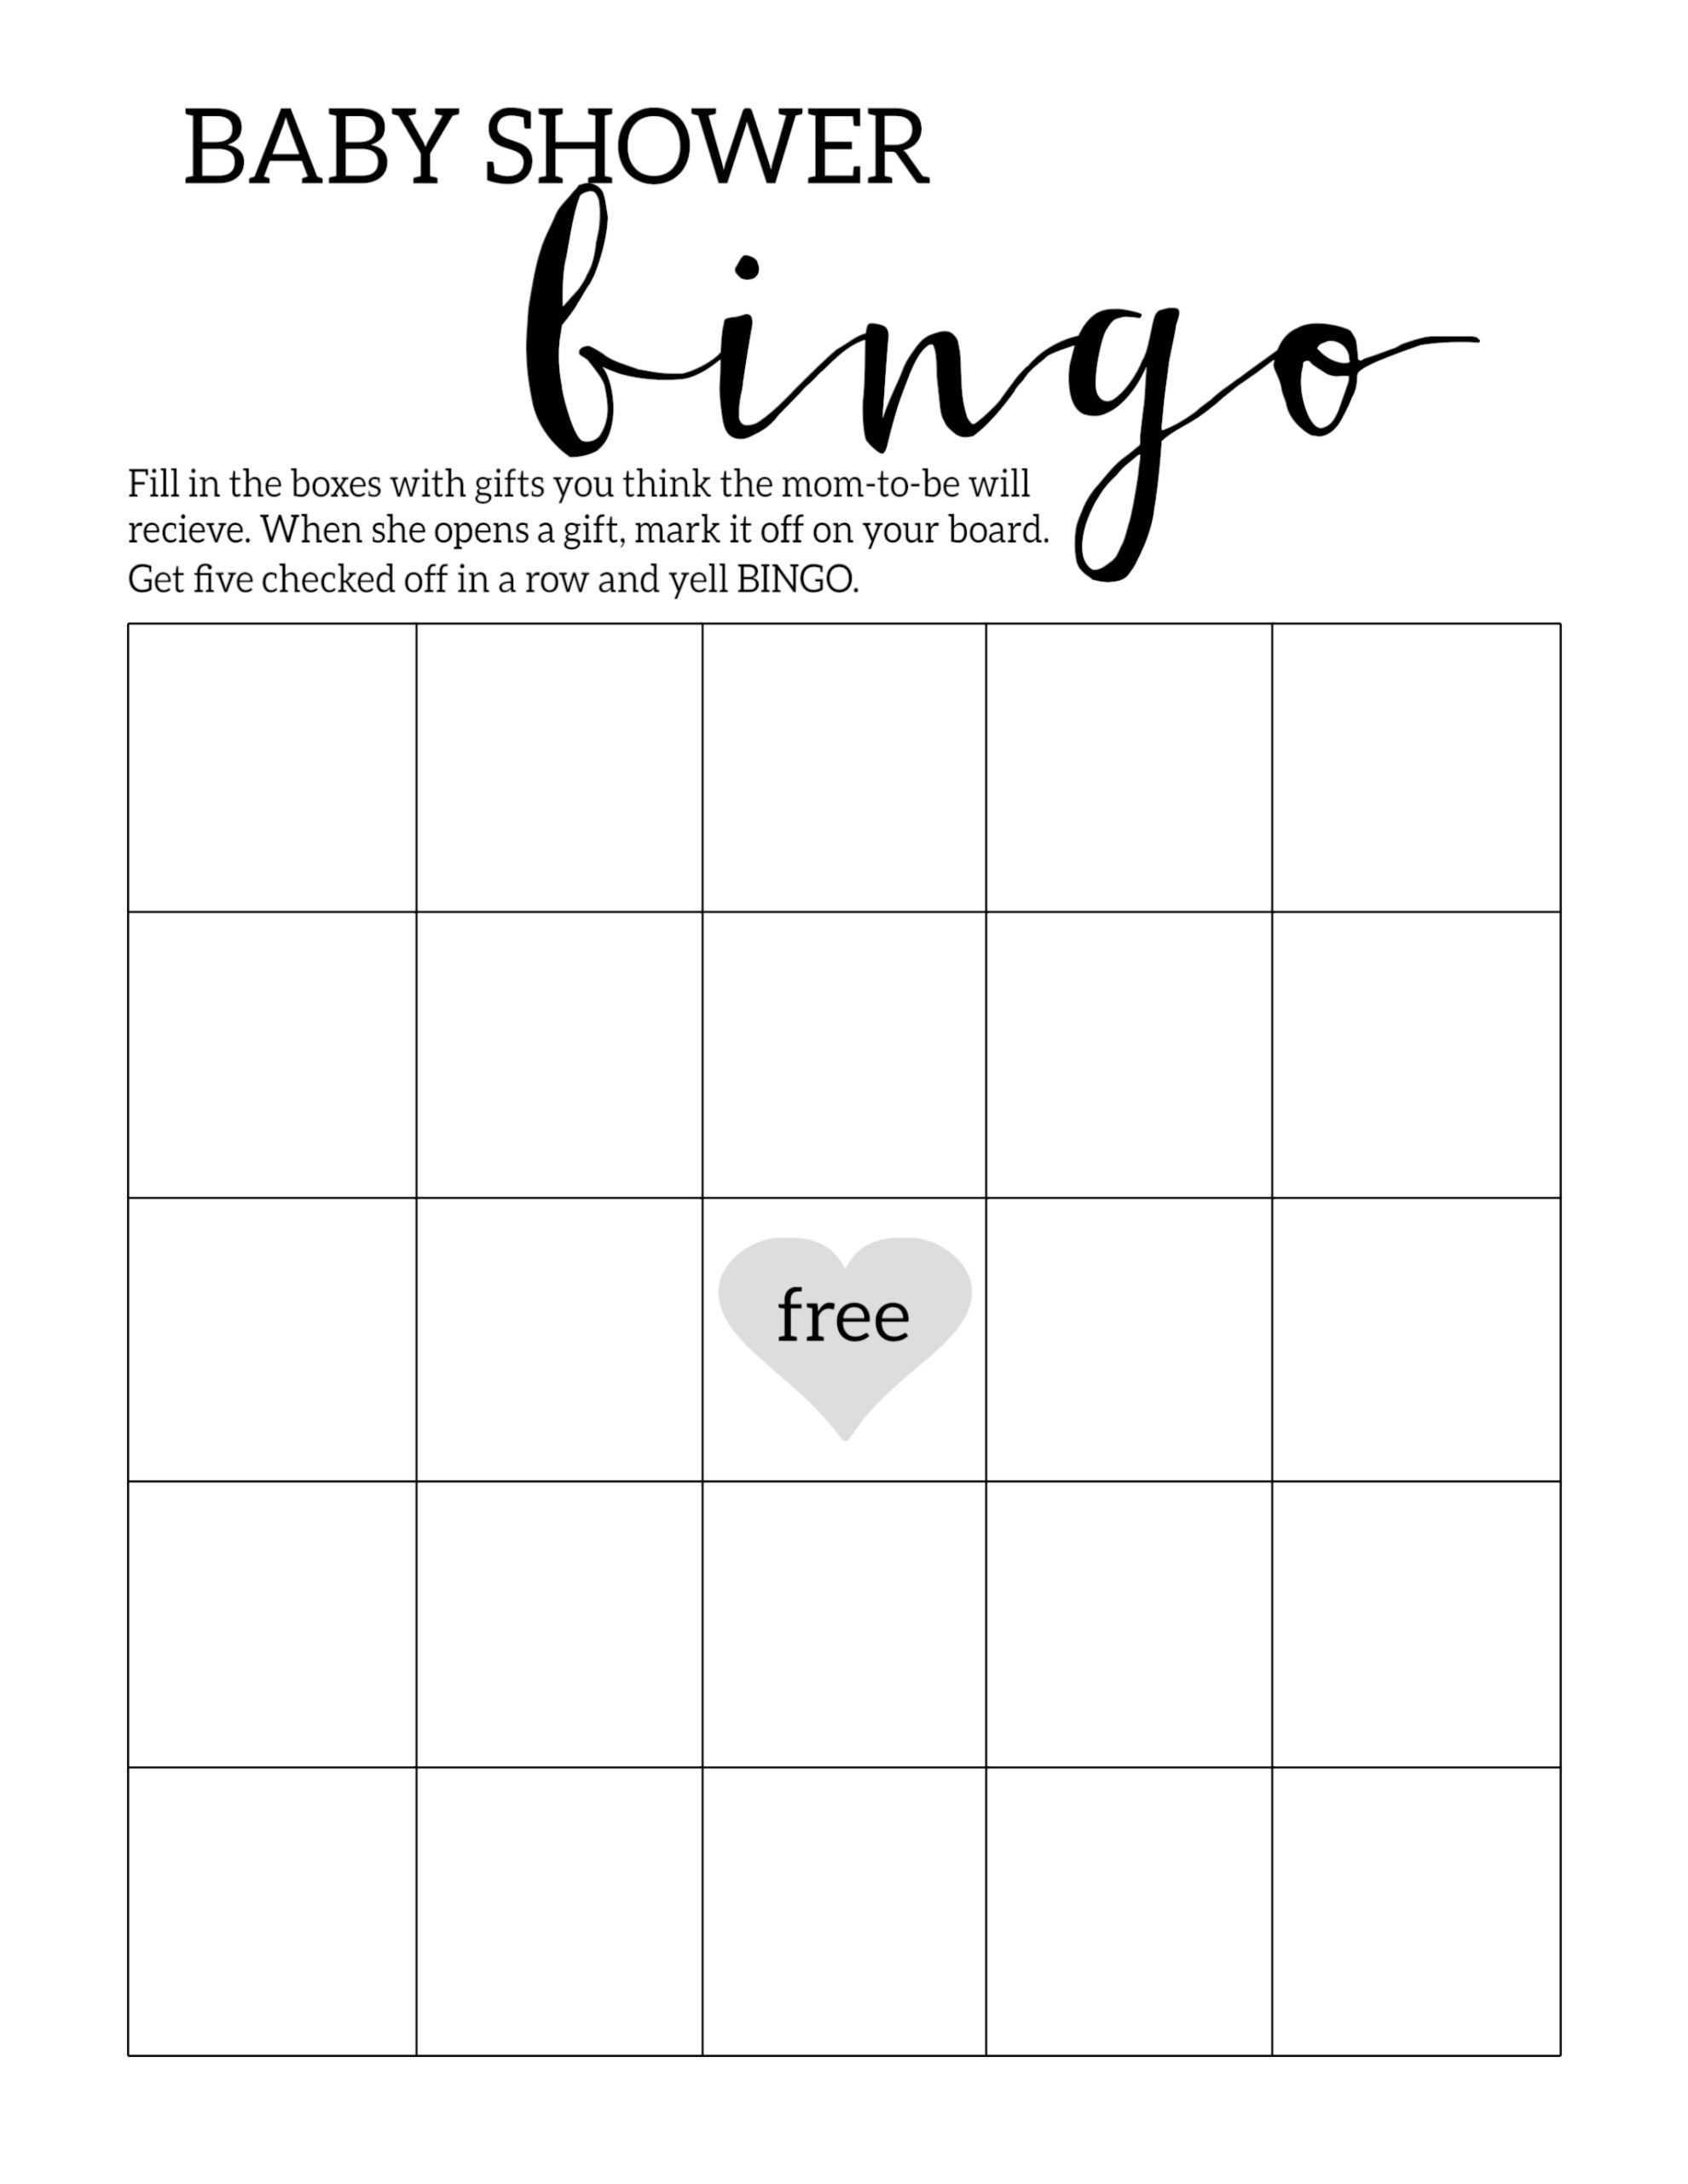 Baby Shower Bingo Printable Cards Template - Paper Trail Design - Free Printable Blank Bingo Cards